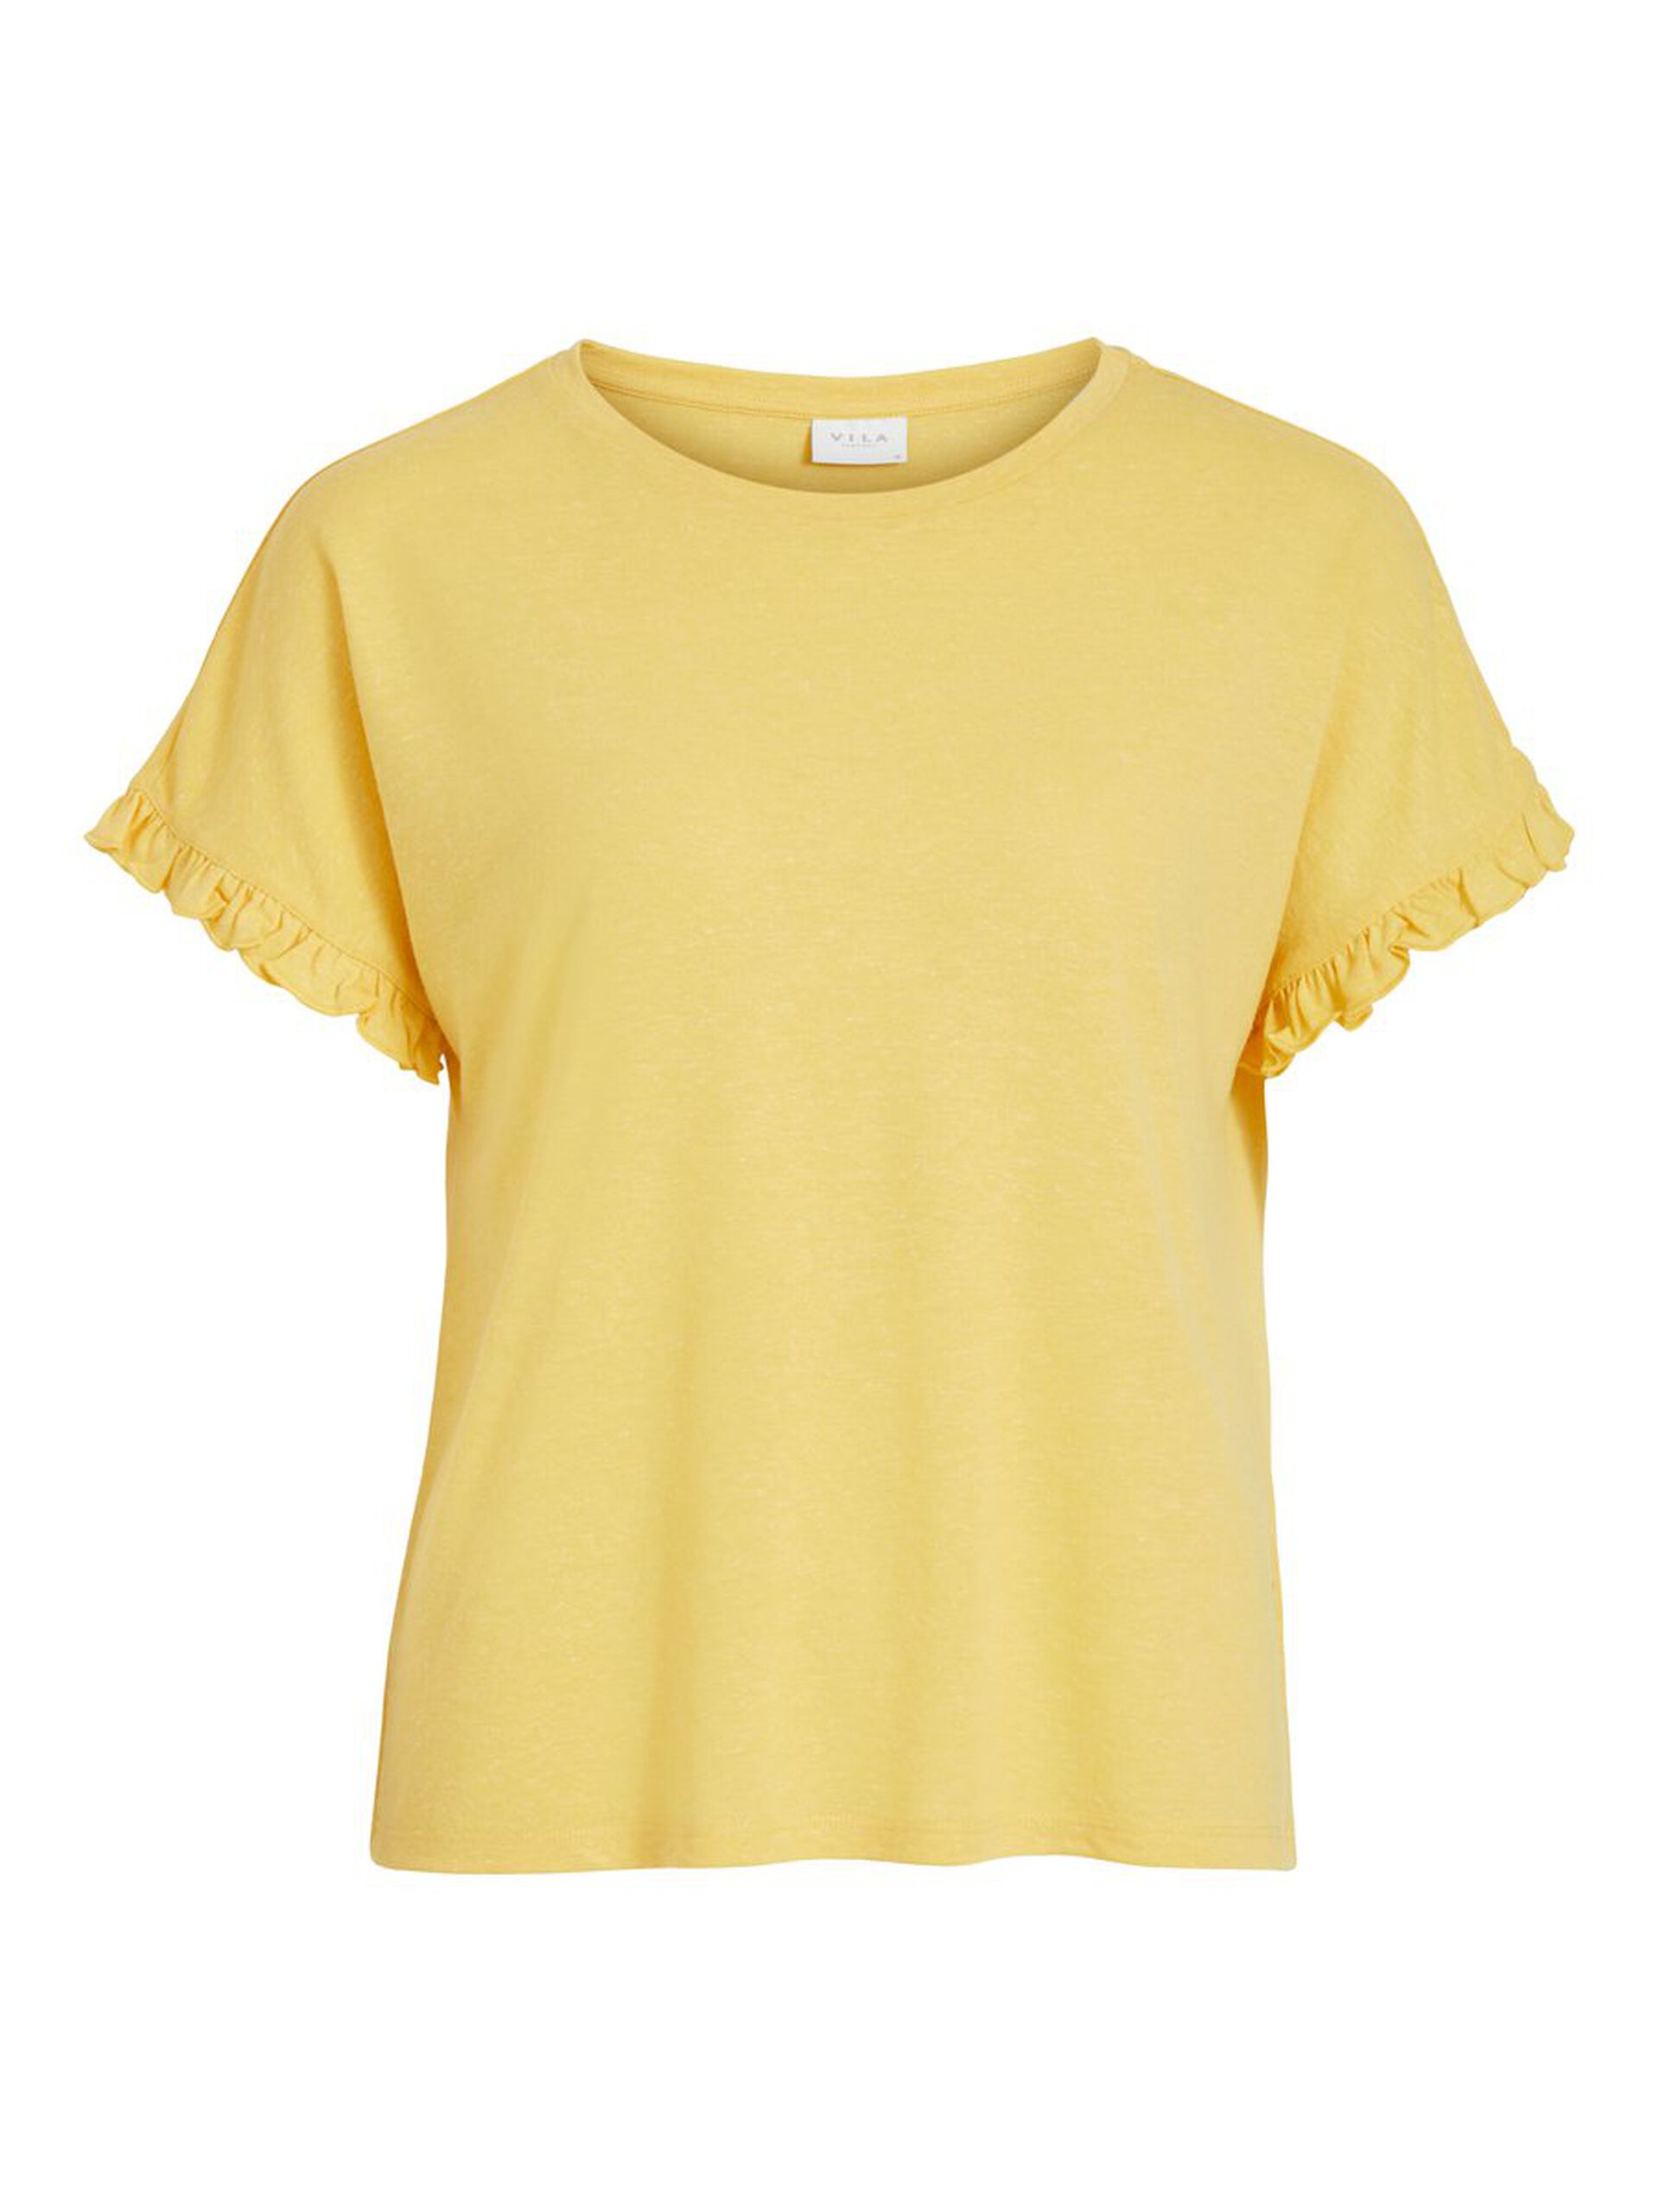 Gul t-skjorte lin